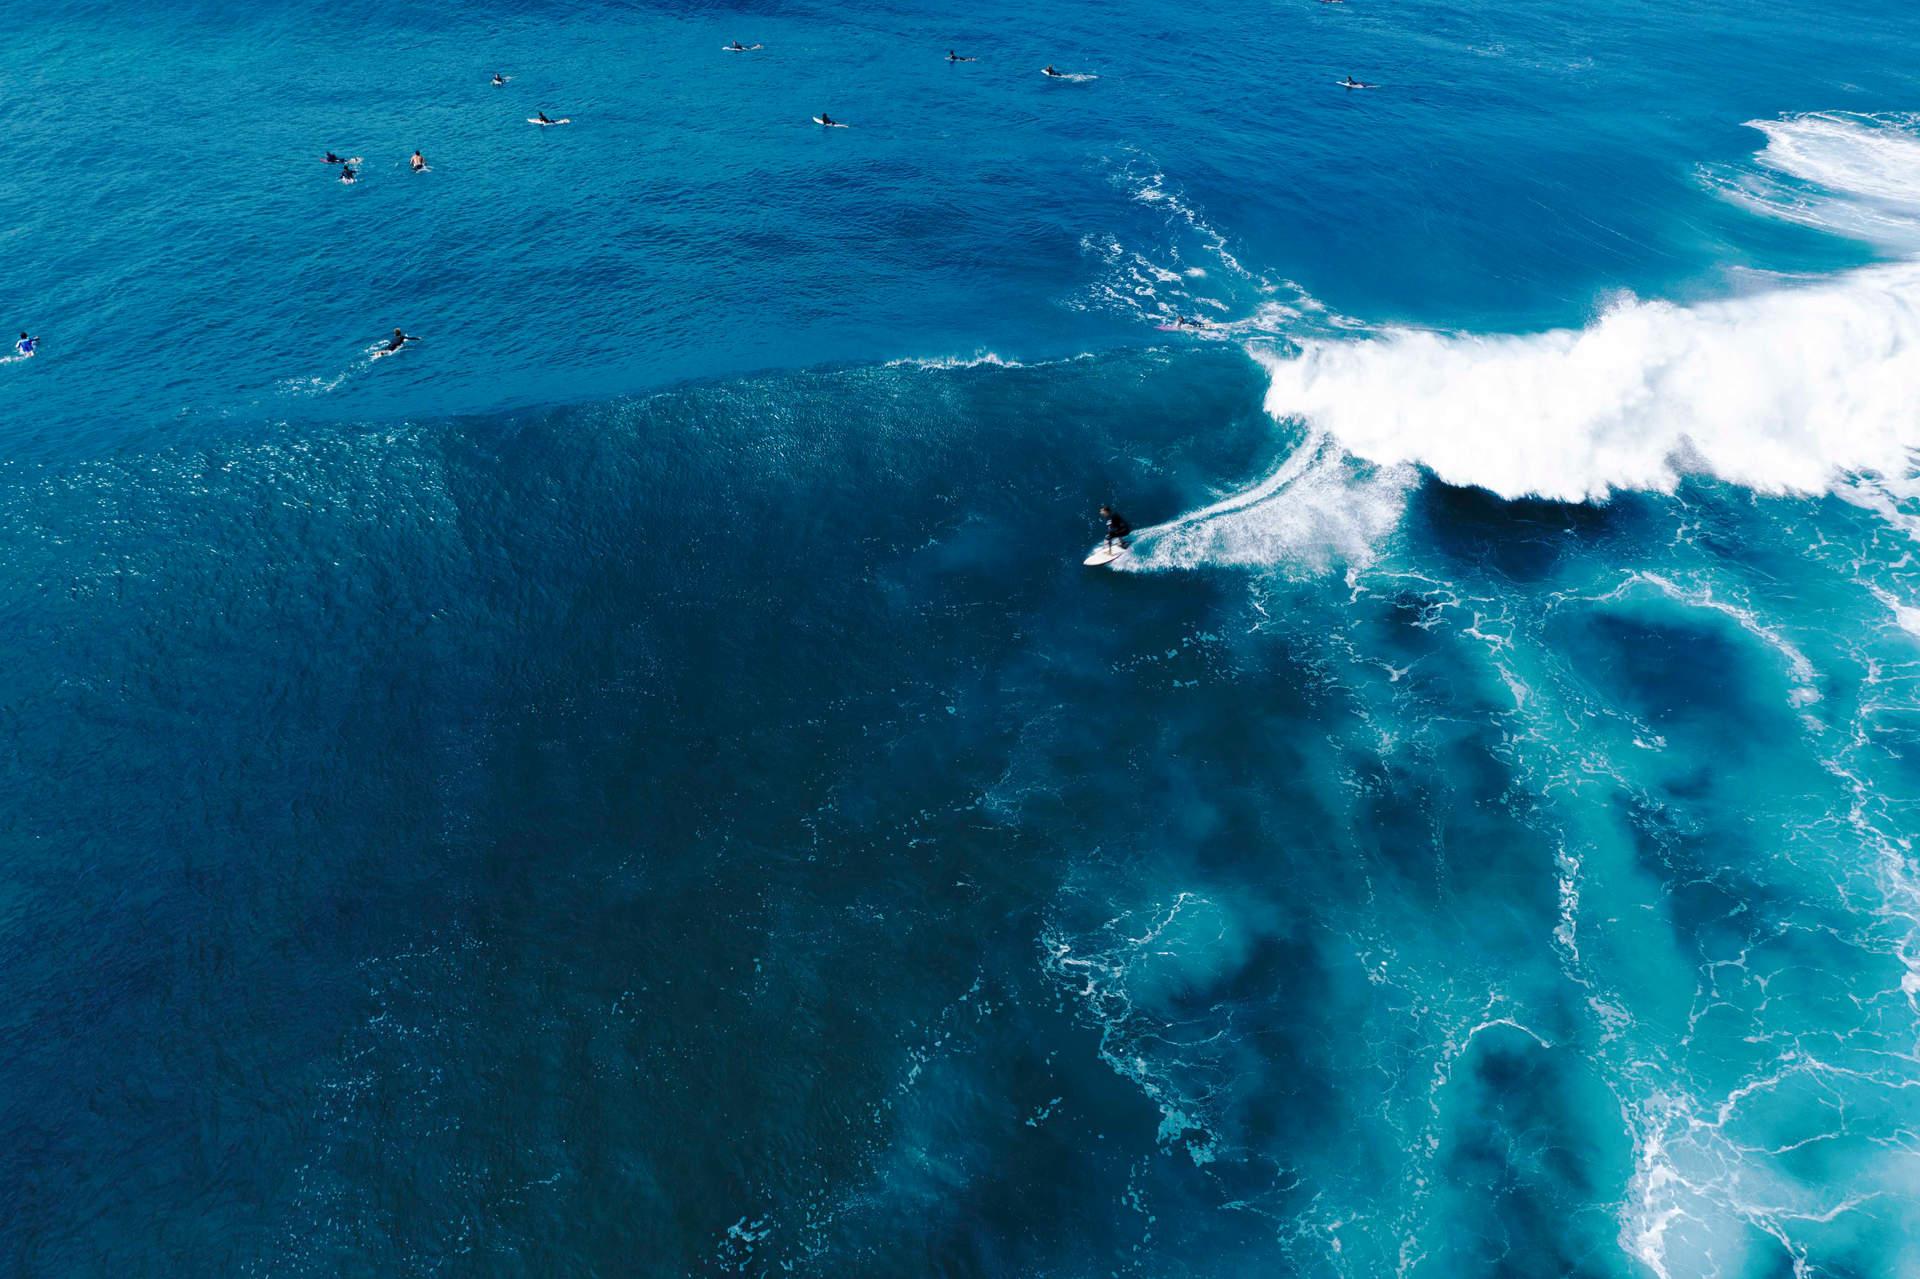 'Electric', Banzai Pipeline, Hawaii